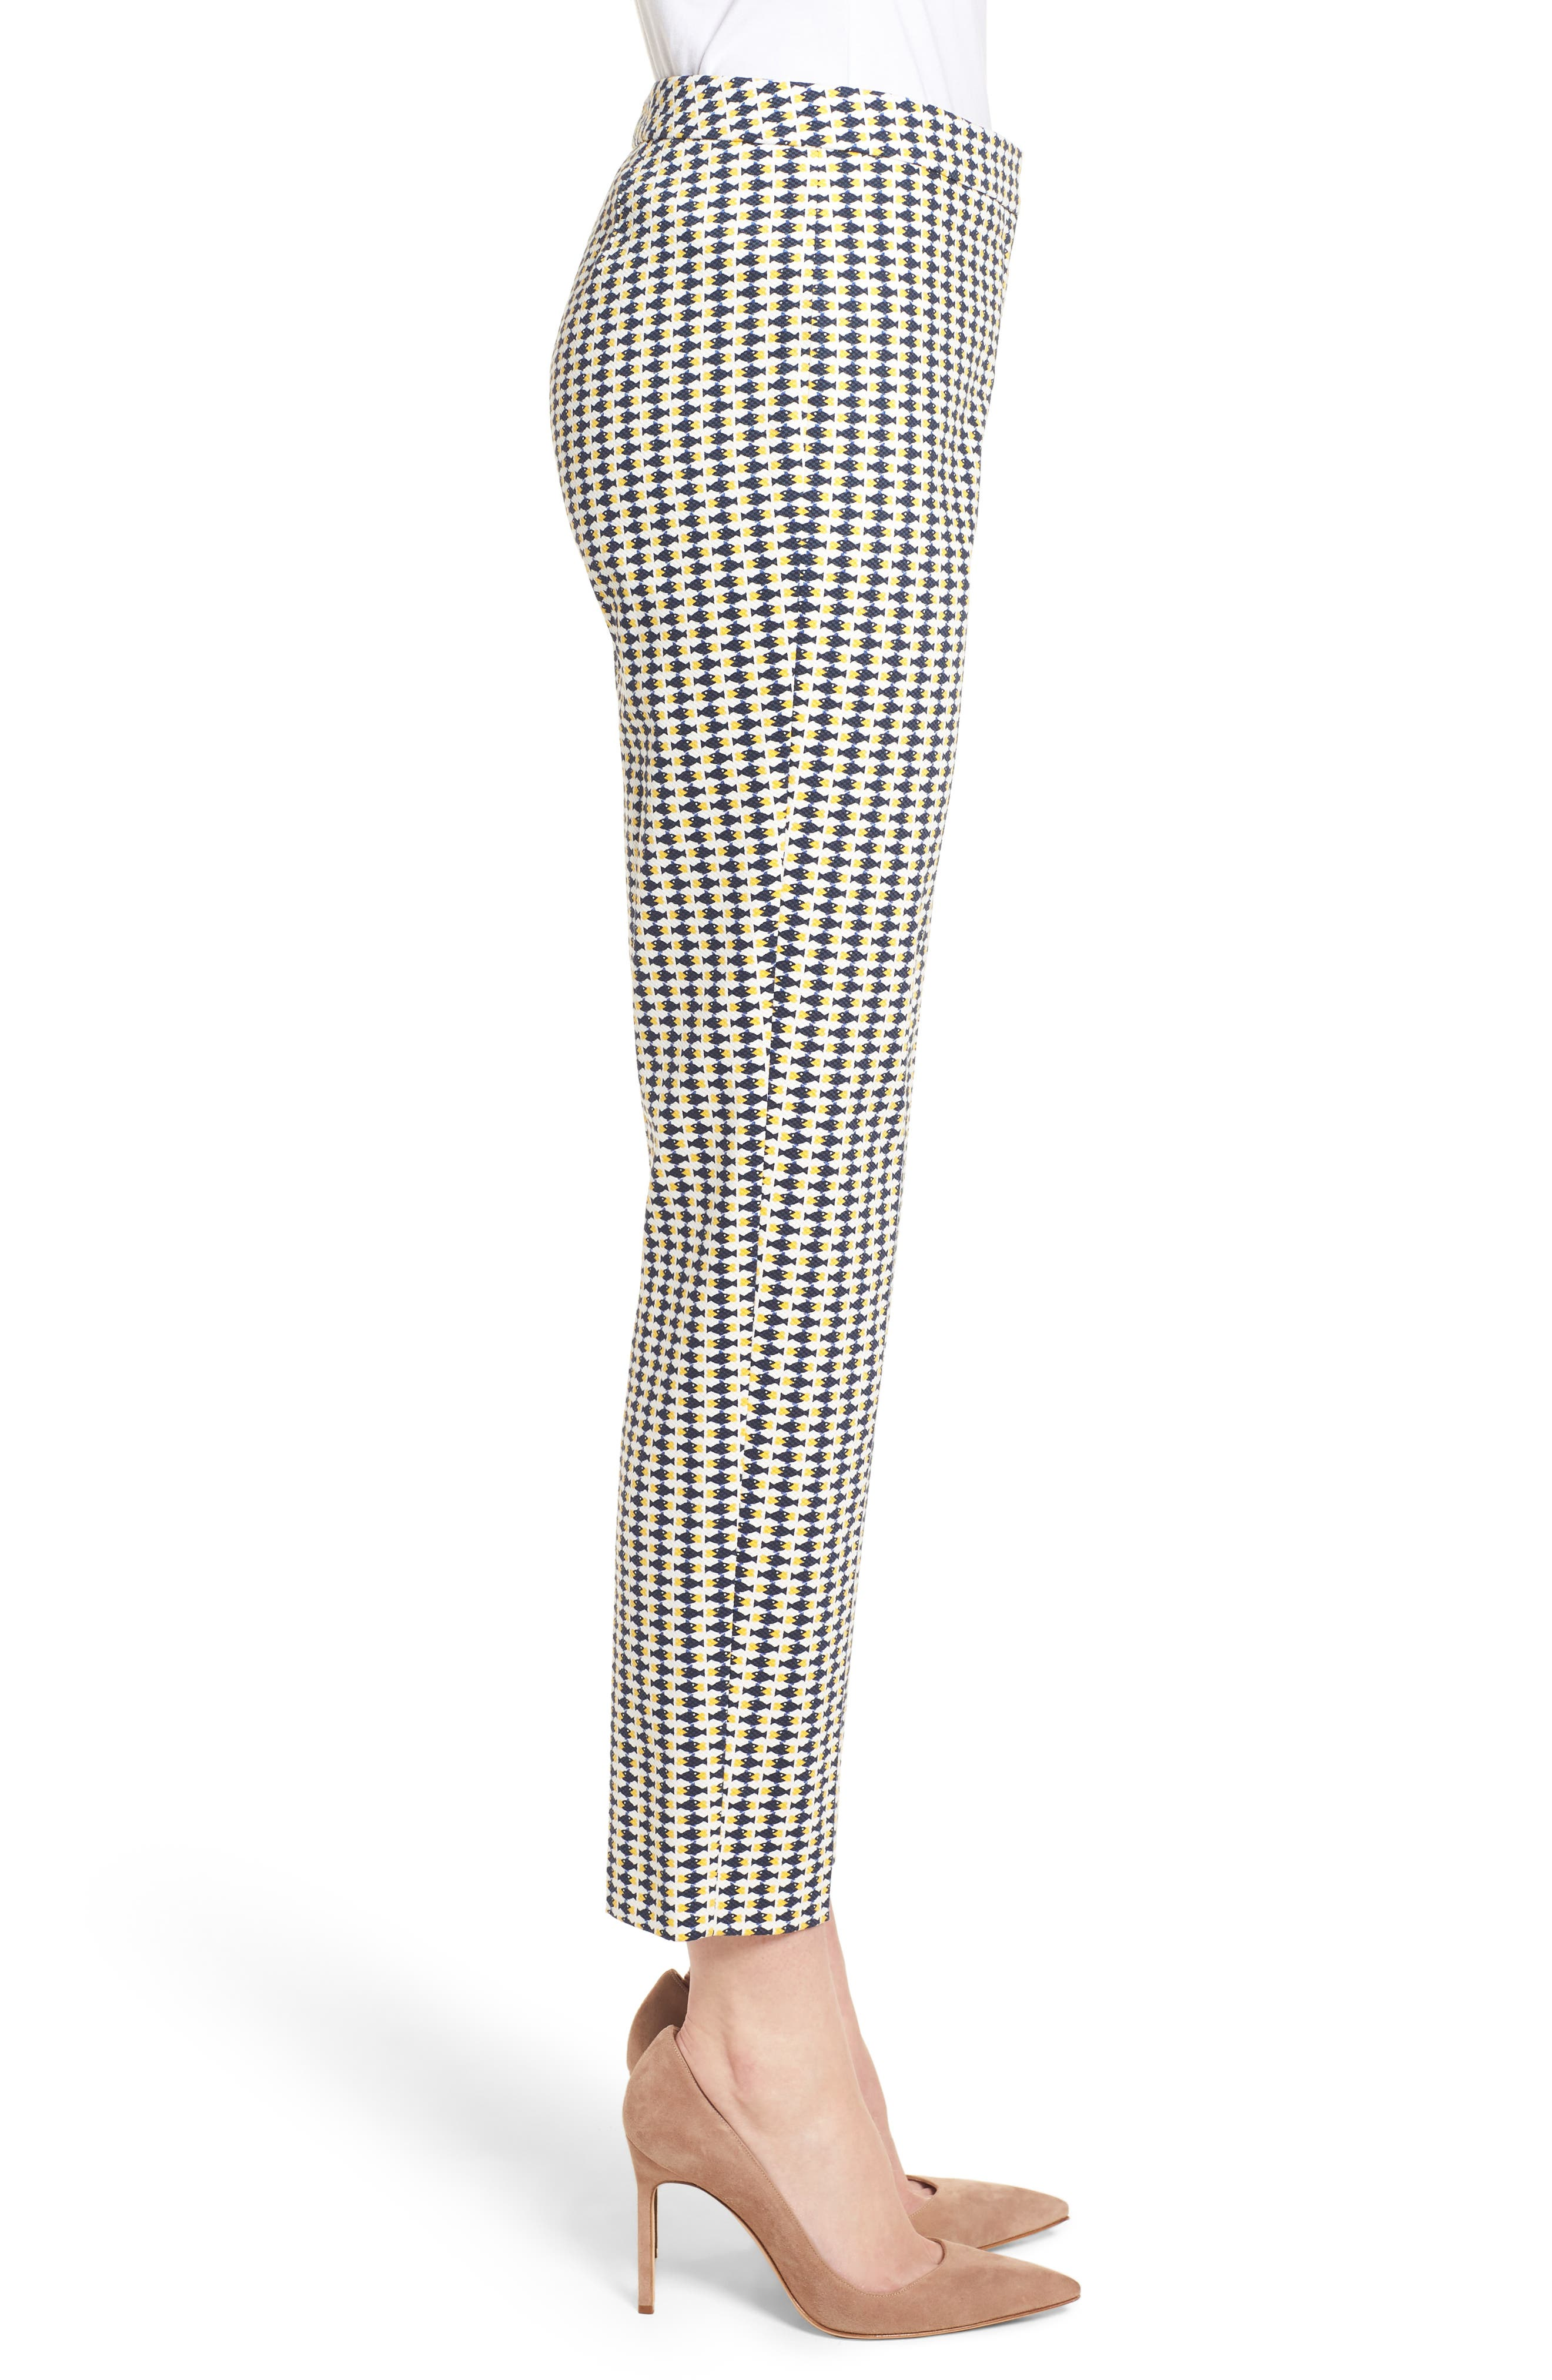 Tiluna6 Heartfish Slim Ankle Trousers,                             Alternate thumbnail 3, color,                             Heart Fishes